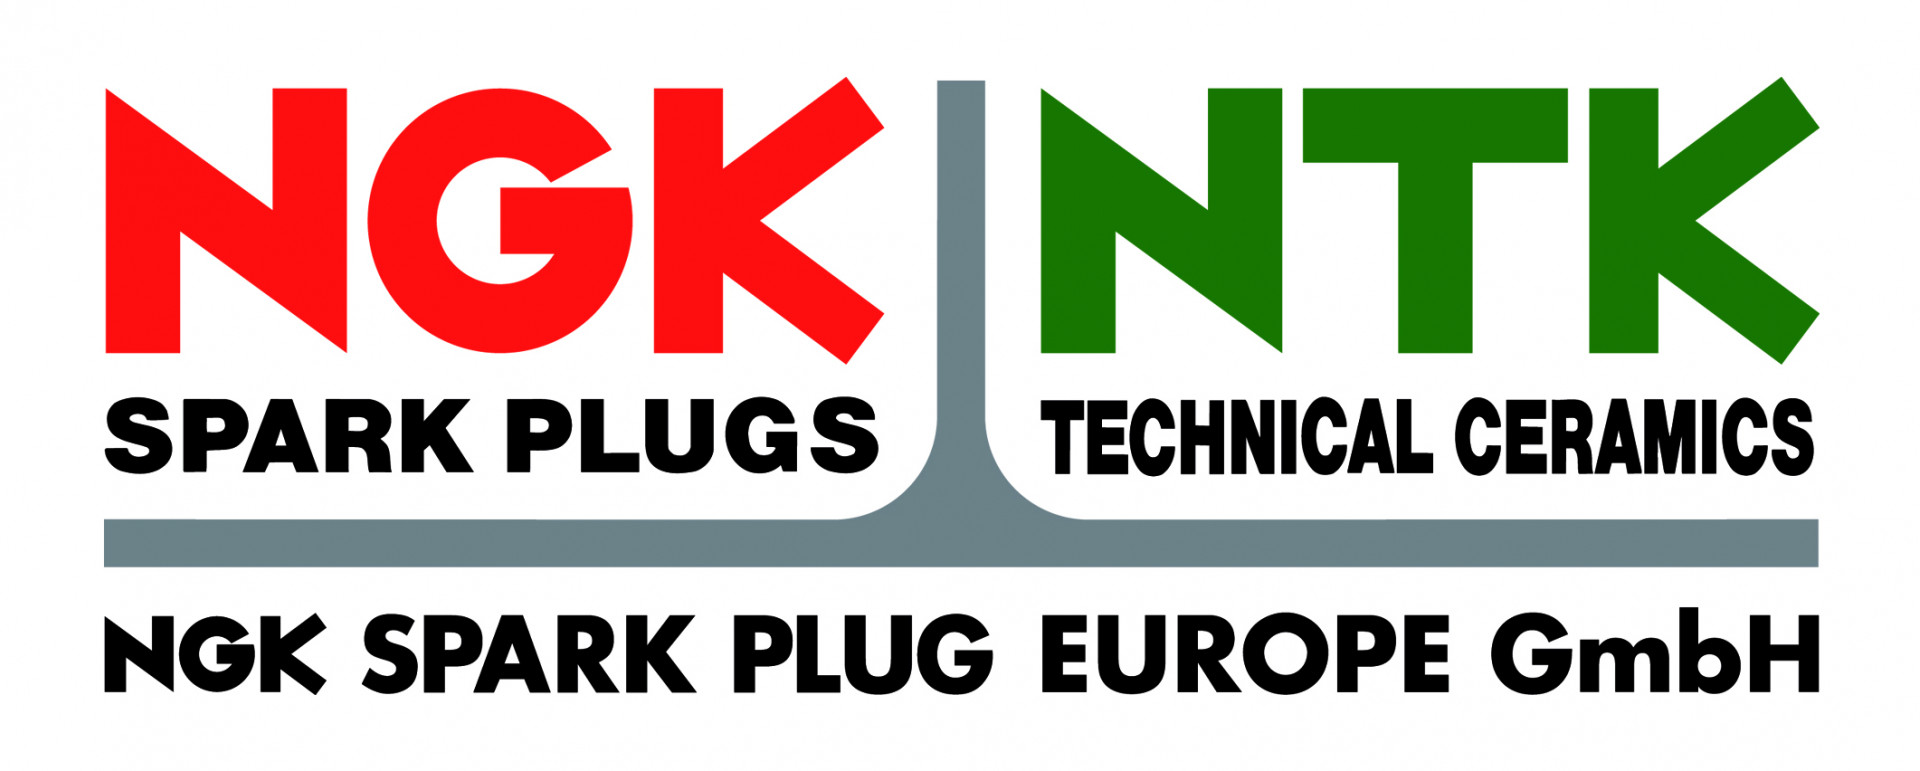 NGK Spark Plug Europe GmbH Twins Mark Logo.jpg